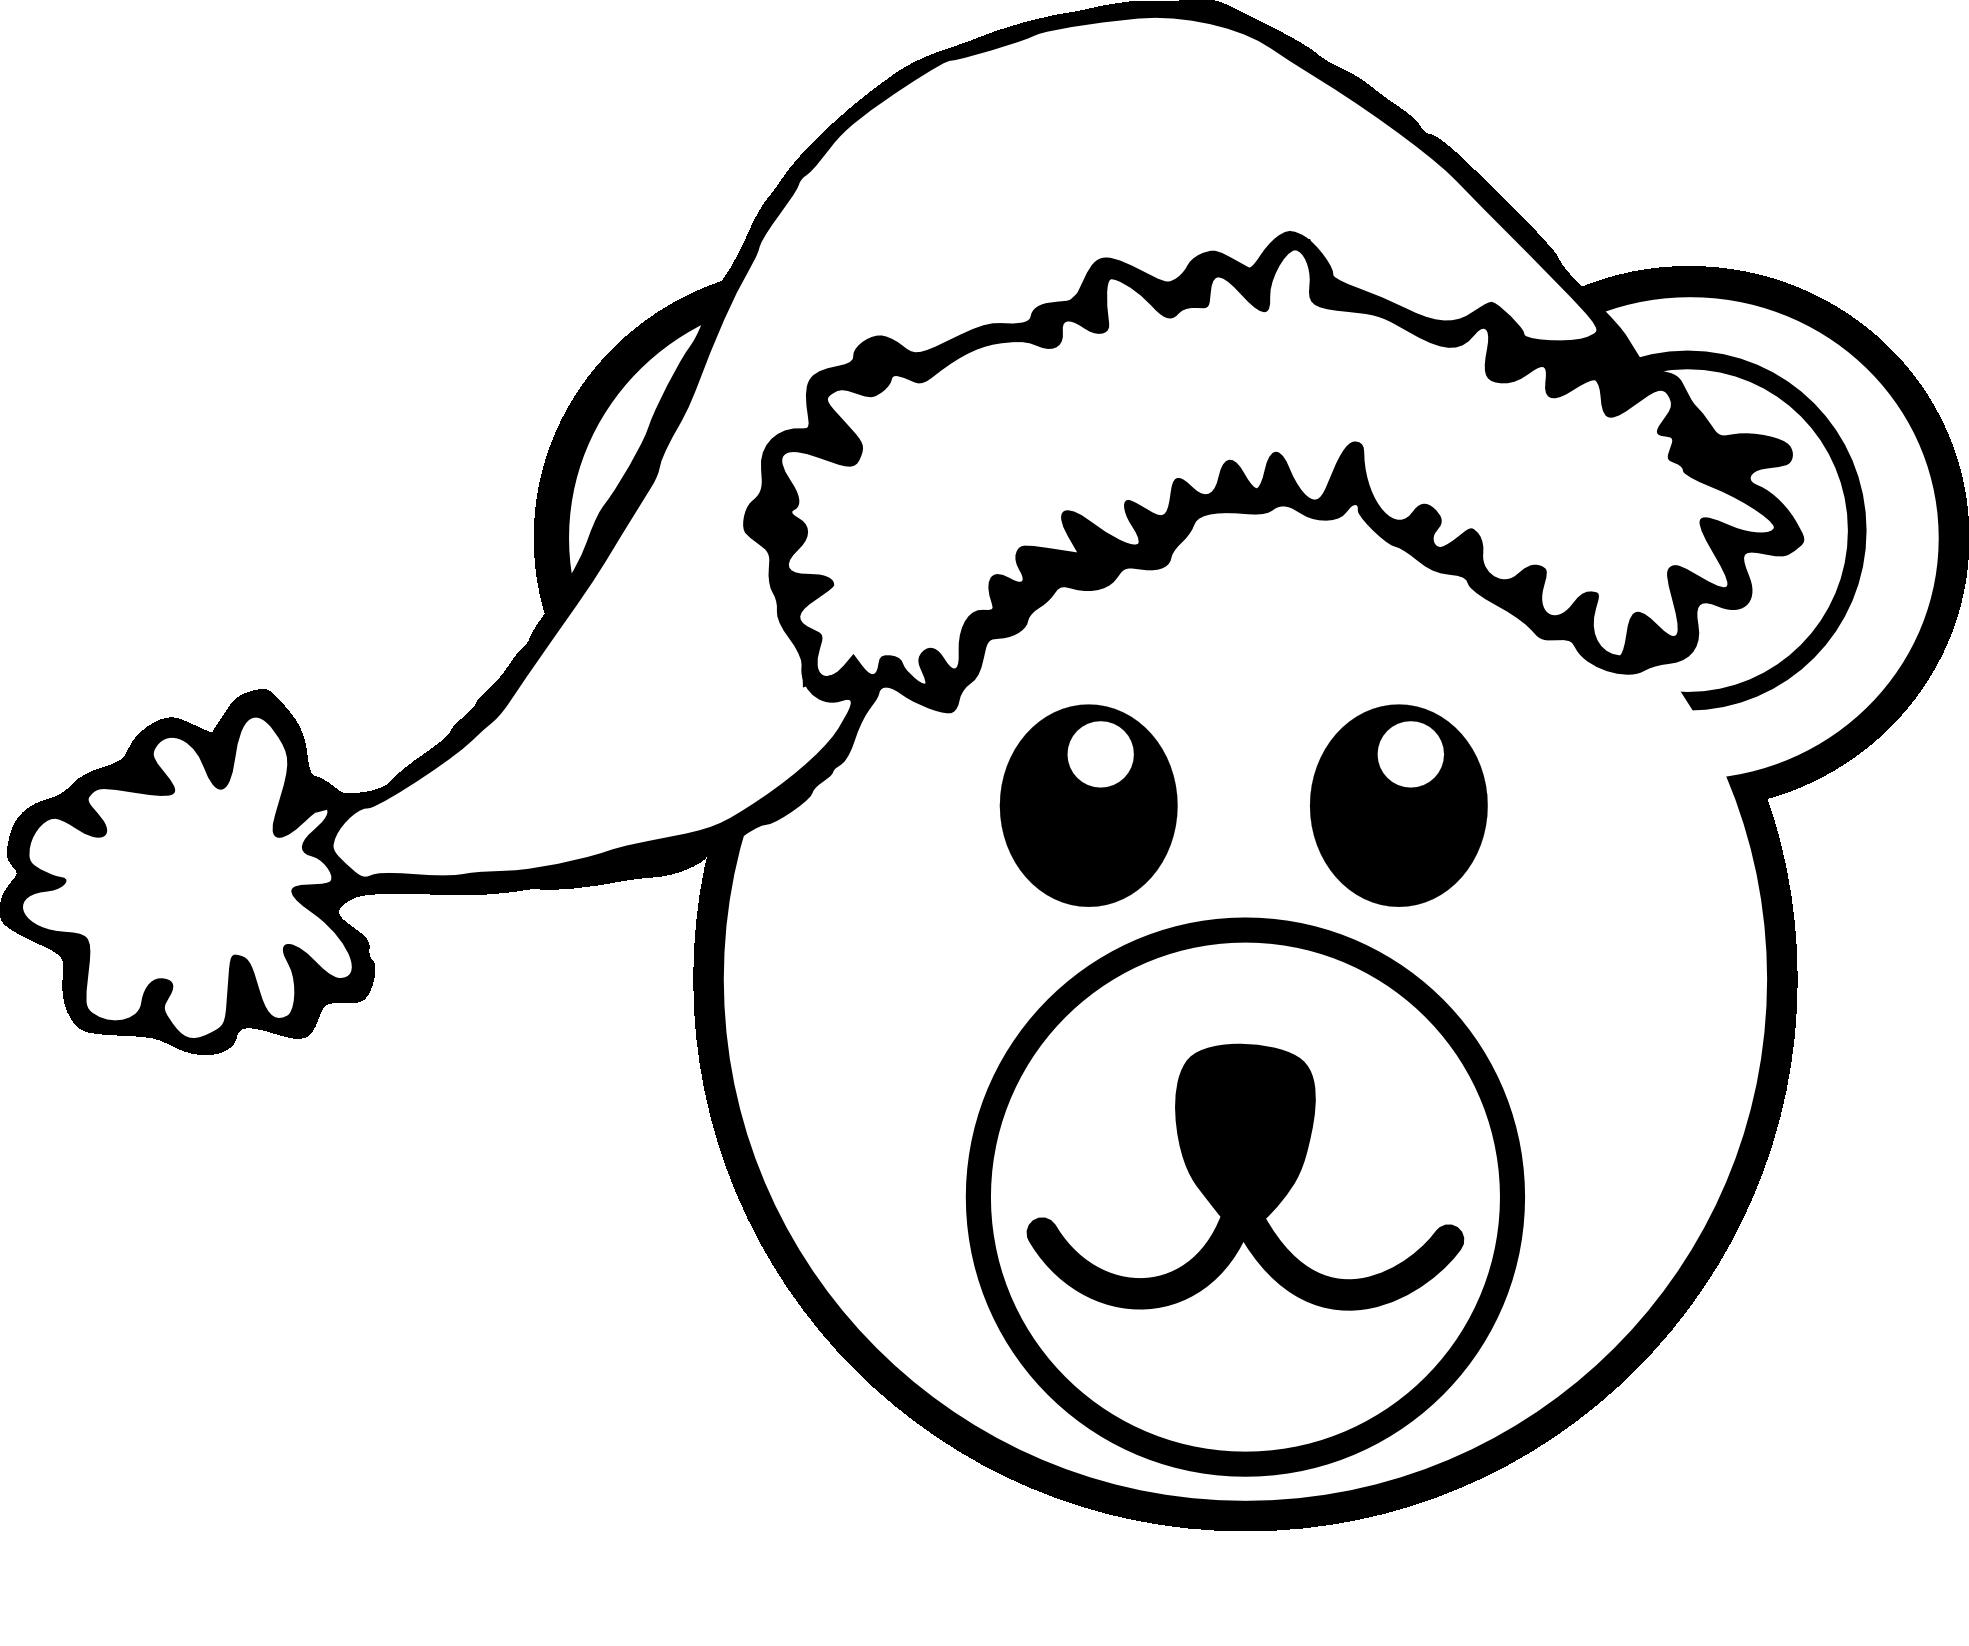 white teddy bear clip art - photo #16